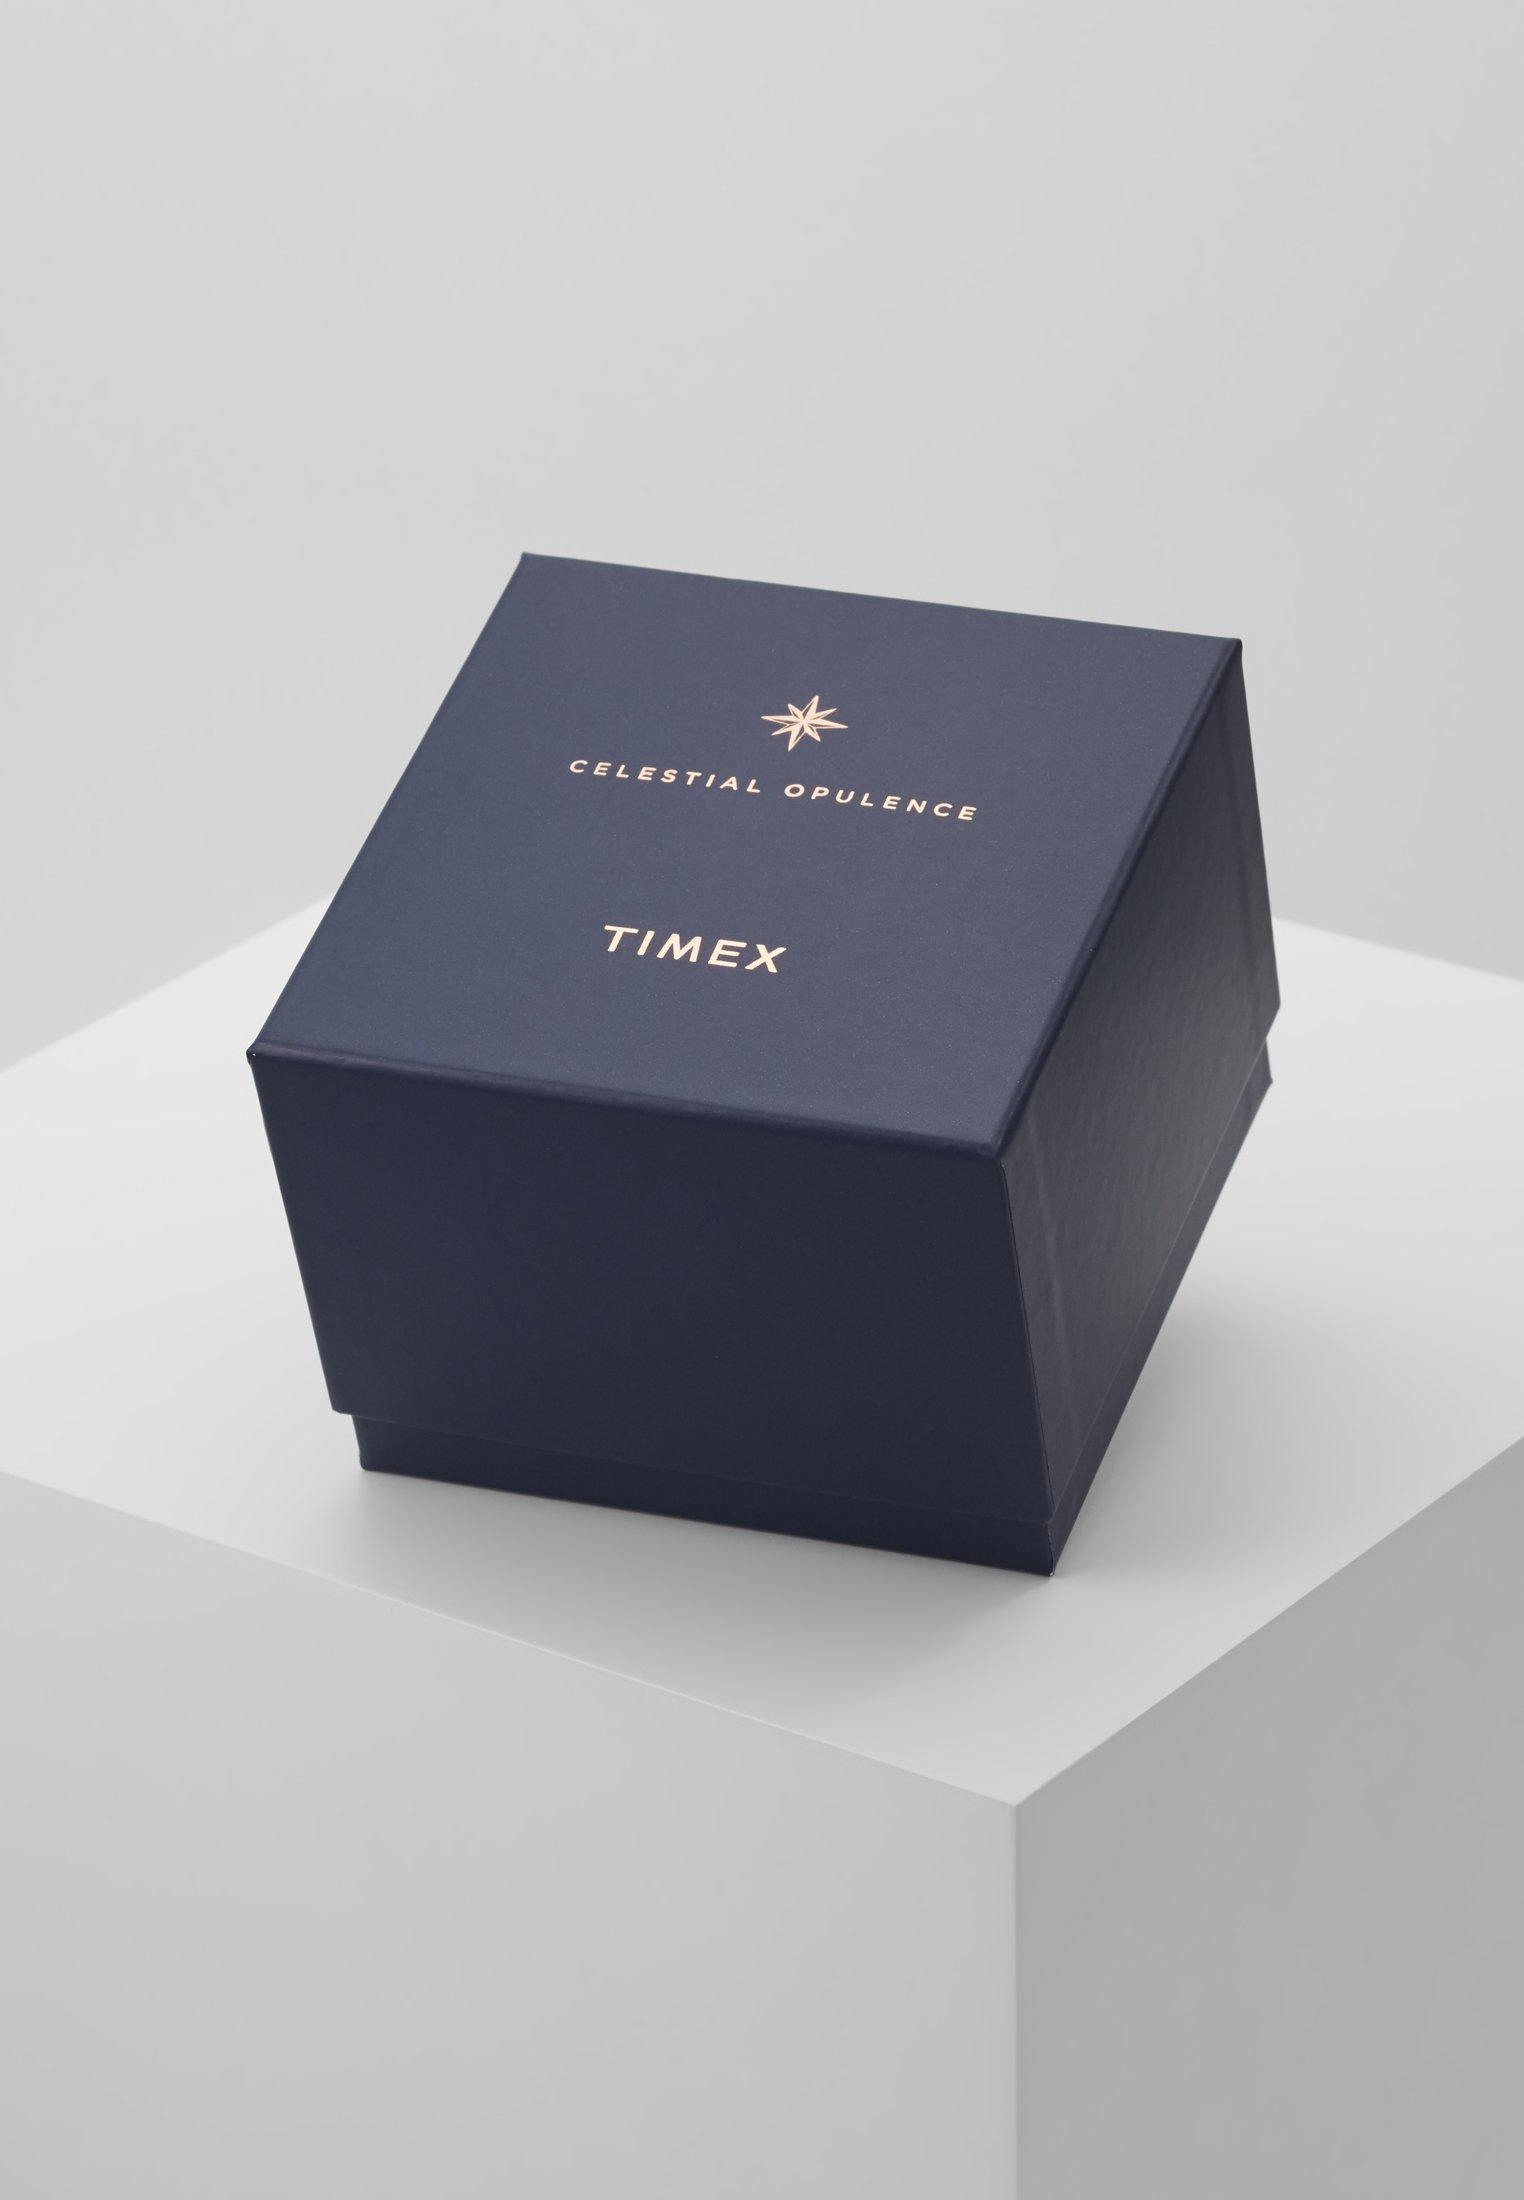 Timex WOMEN'S CELESTRIAL OPULENCE WITH SWAROVSKI BLACK DIAL - Klokke - black/svart rHFbMyF1kv5LhuC